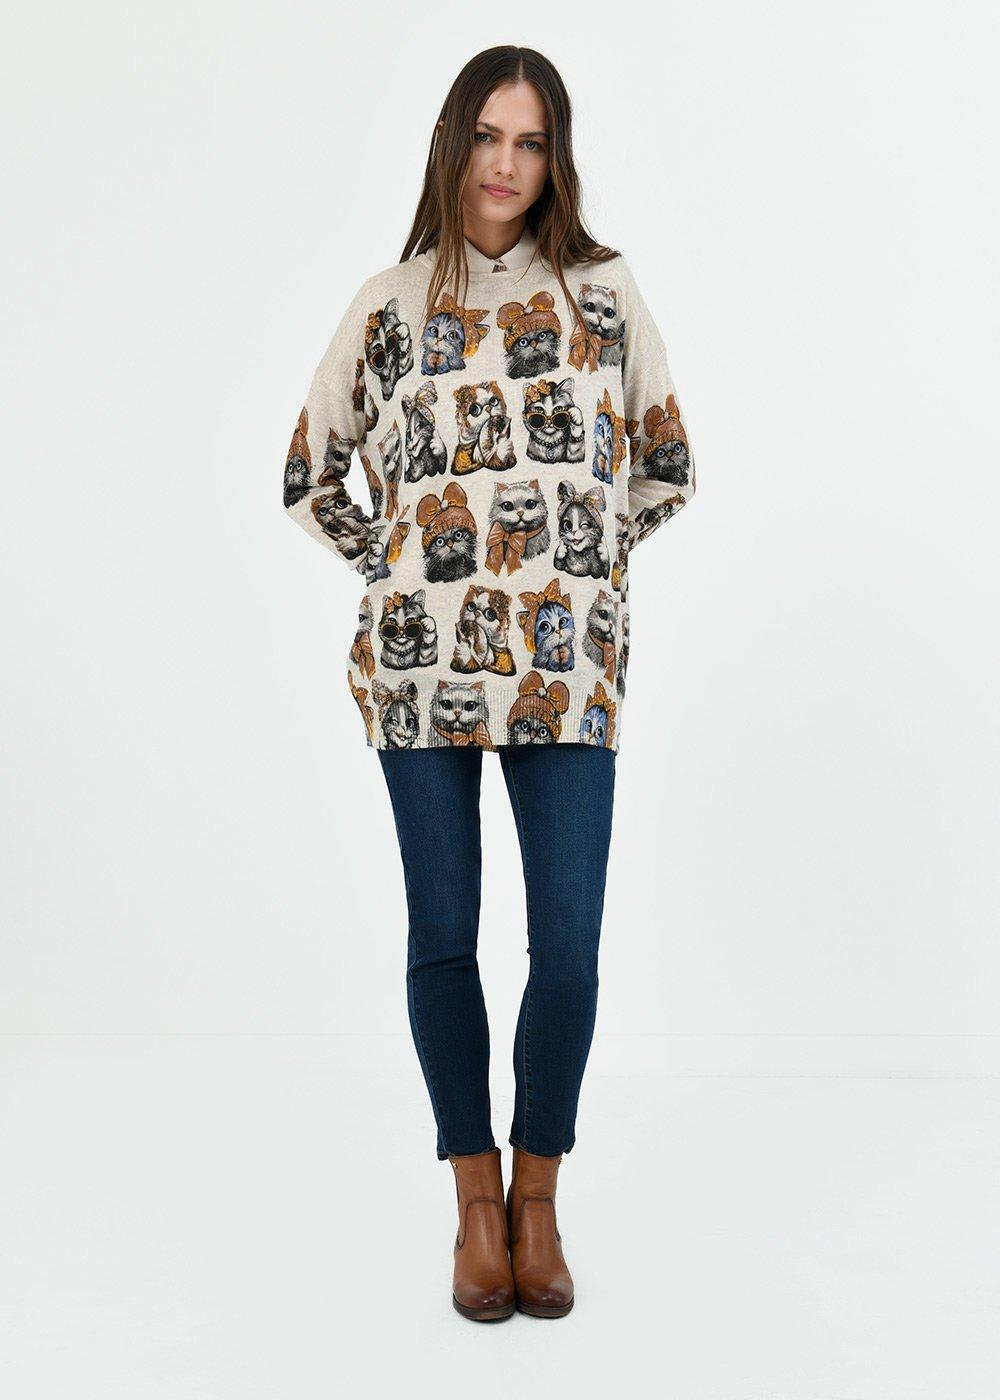 T-shirt Monique stampa gatti - Light Beige\ Black\ Fantasia - Donna